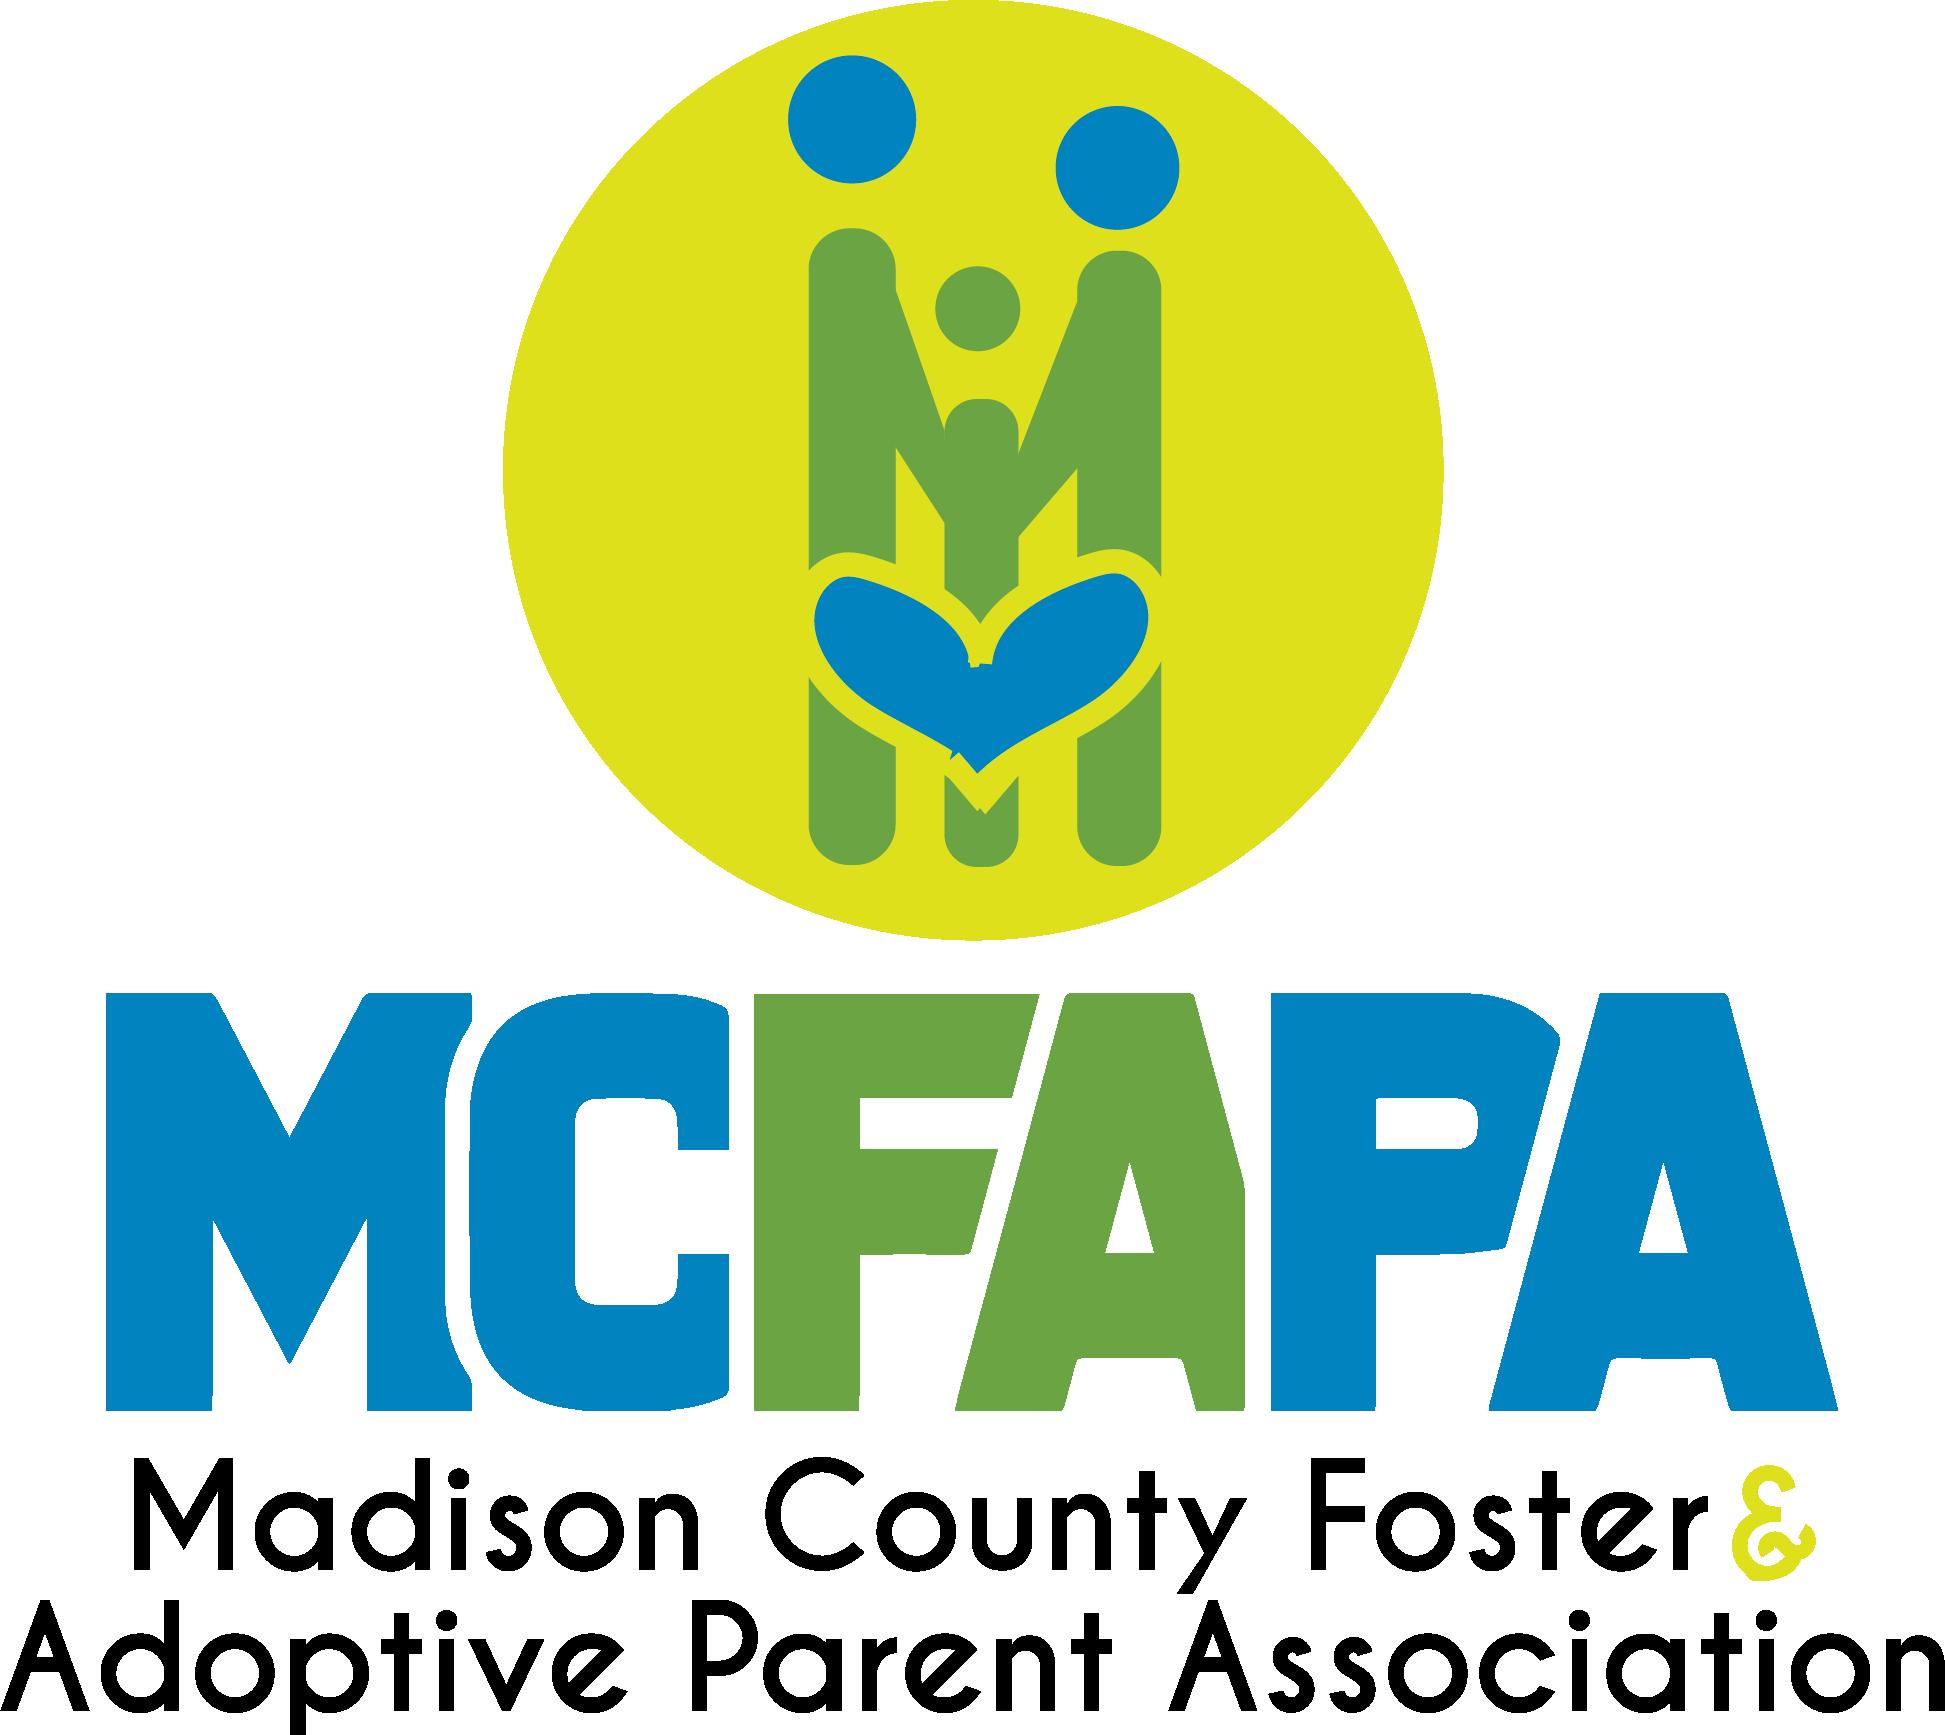 Madison Co. Foster & Adoptive Parent Association Logo